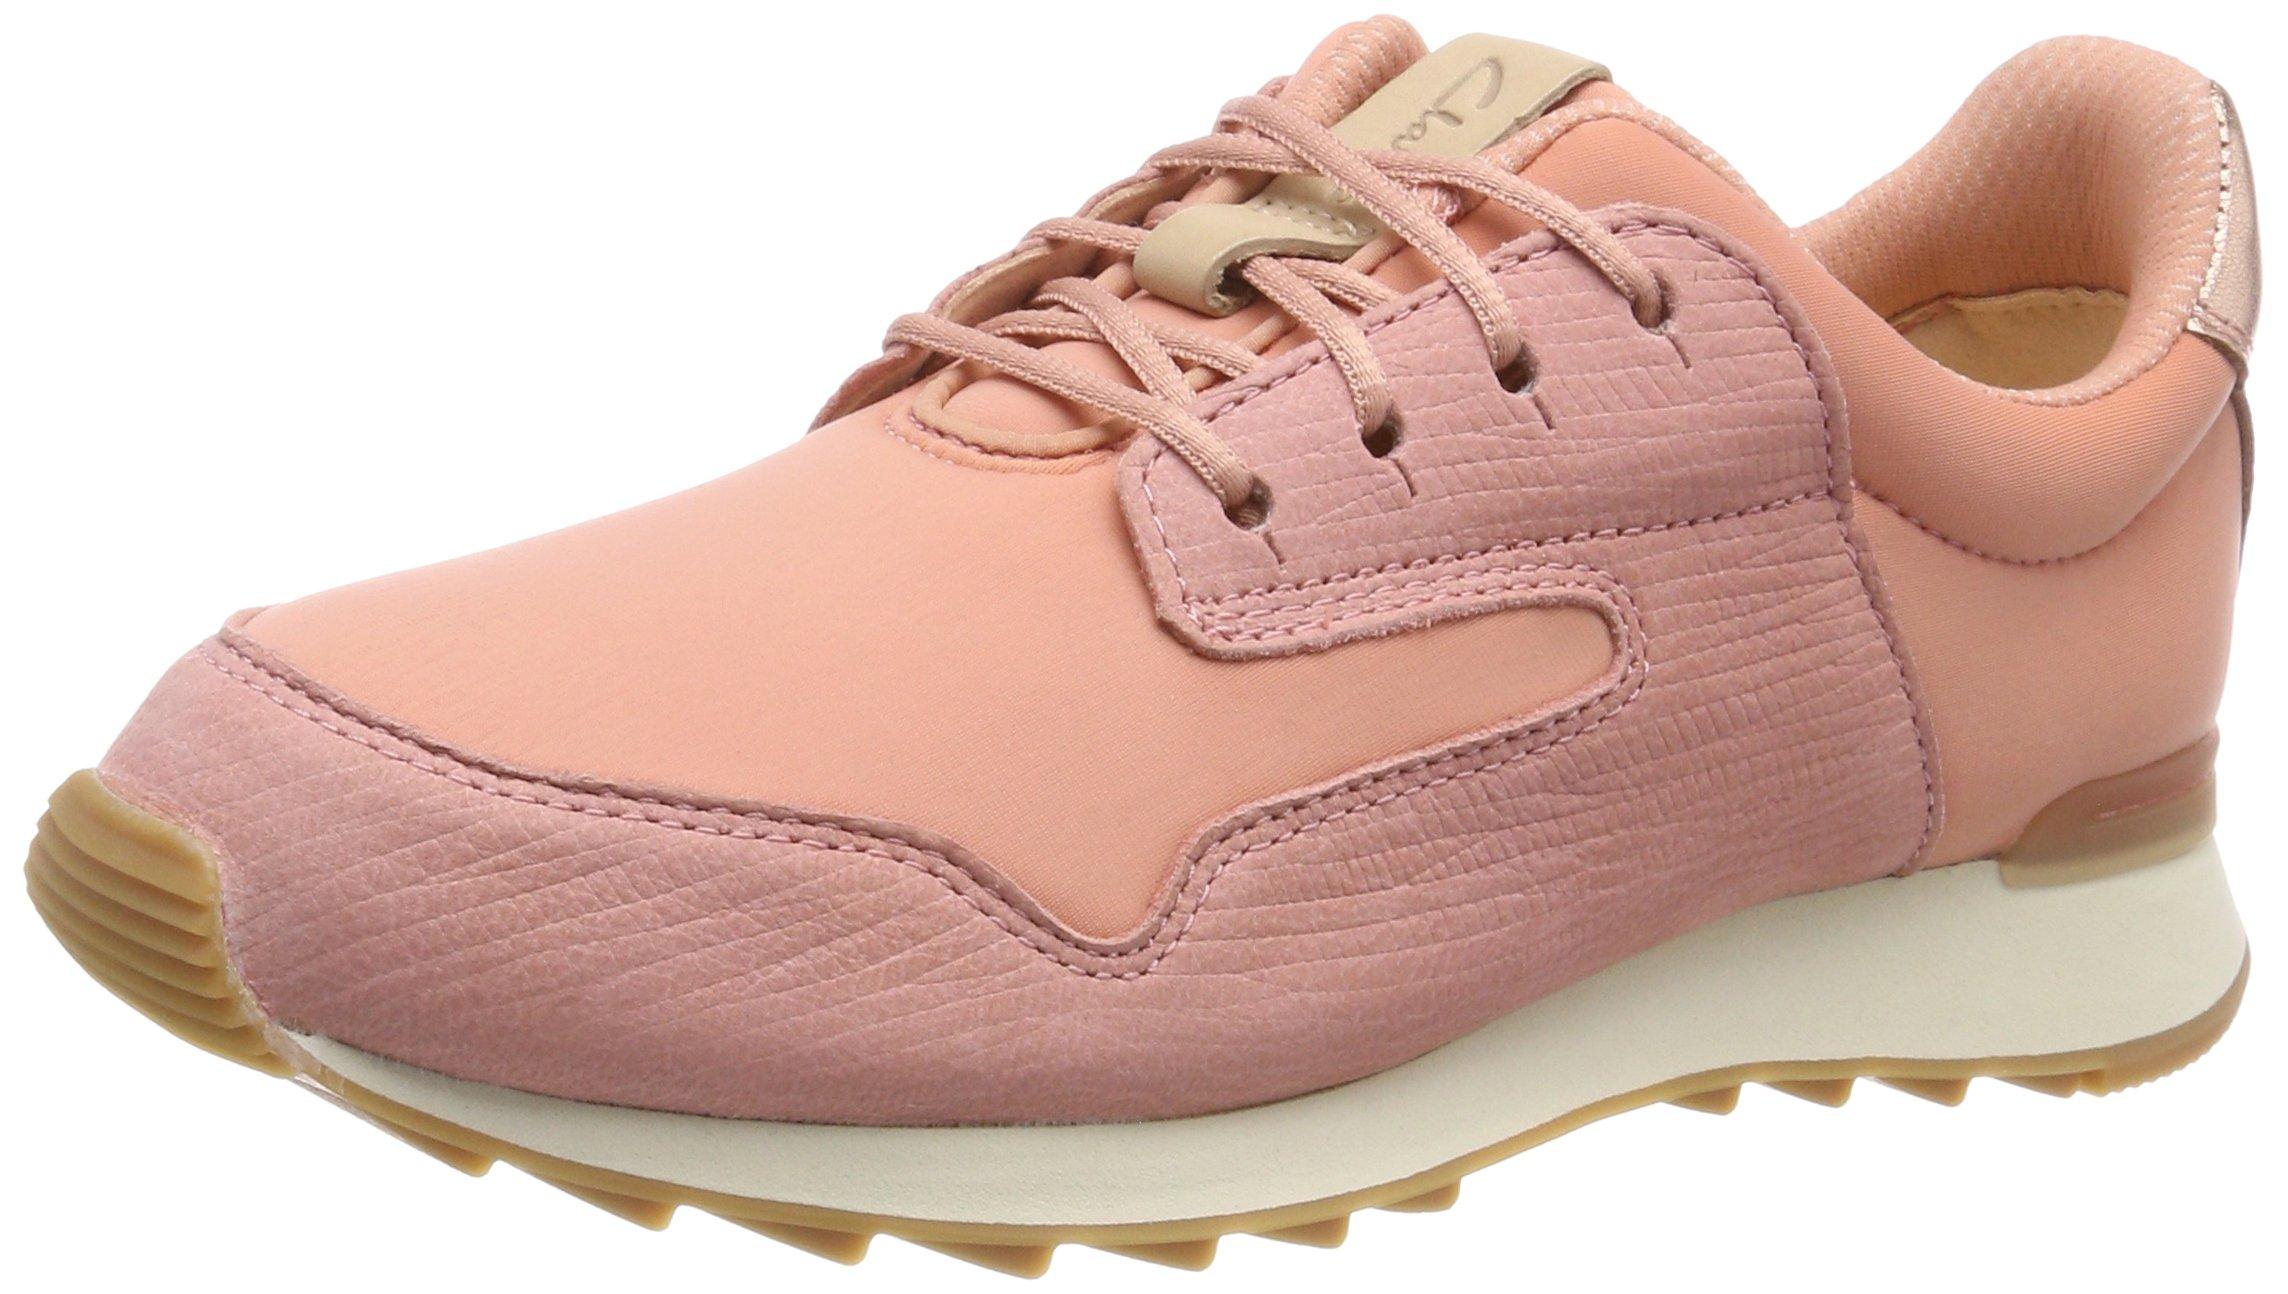 Clarks Eu MixSneakers Basses Combi41 FemmeRosepink Floura SUGqMzVpL